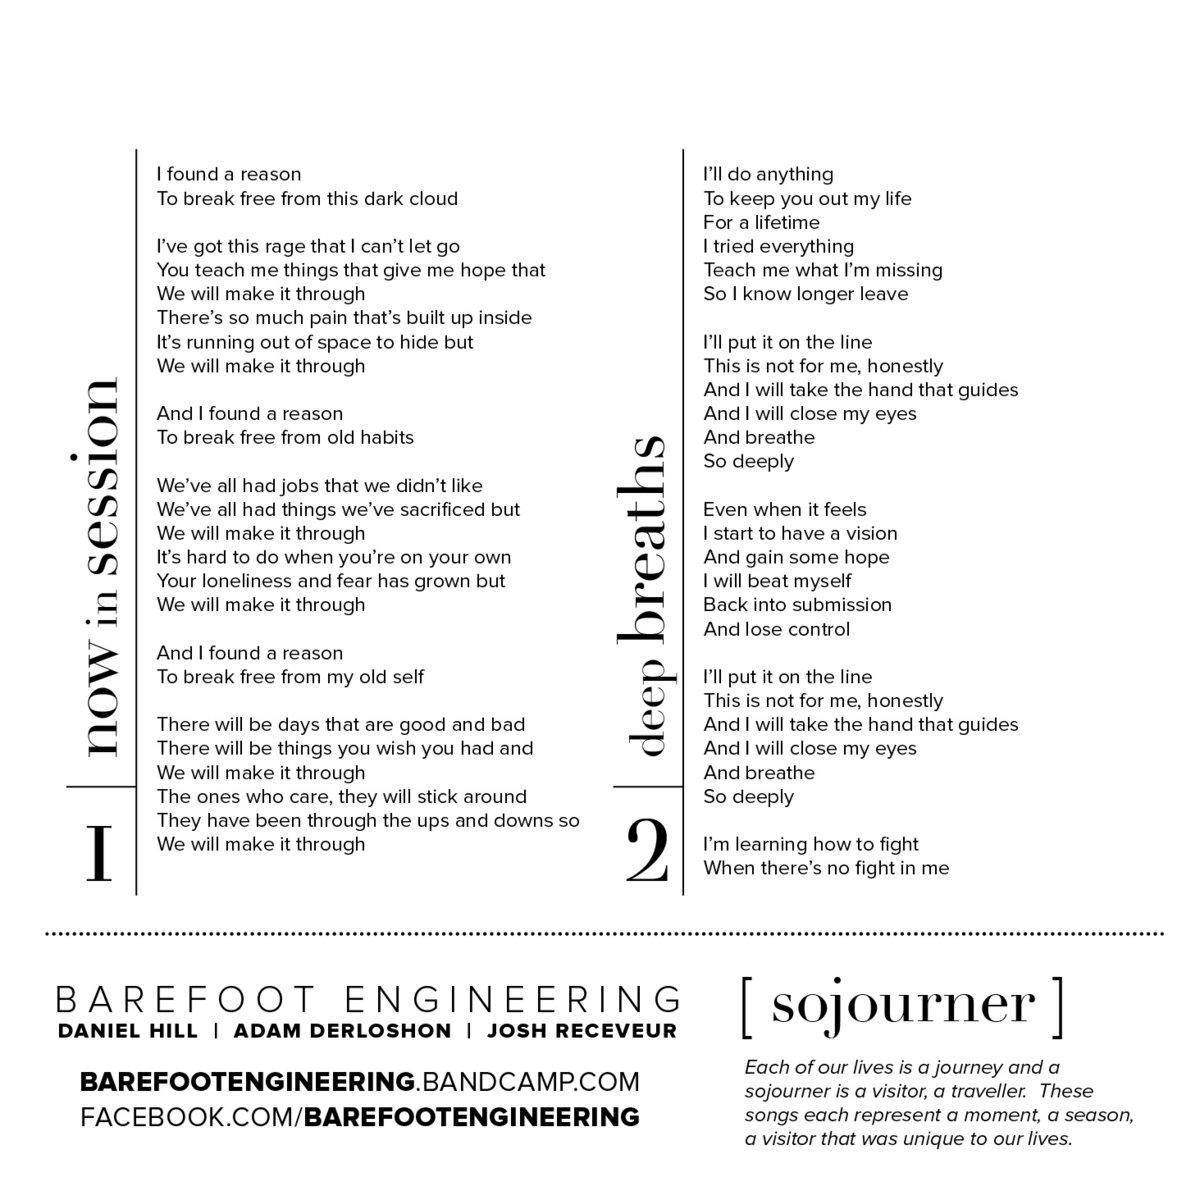 sojourner | Barefoot Engineering